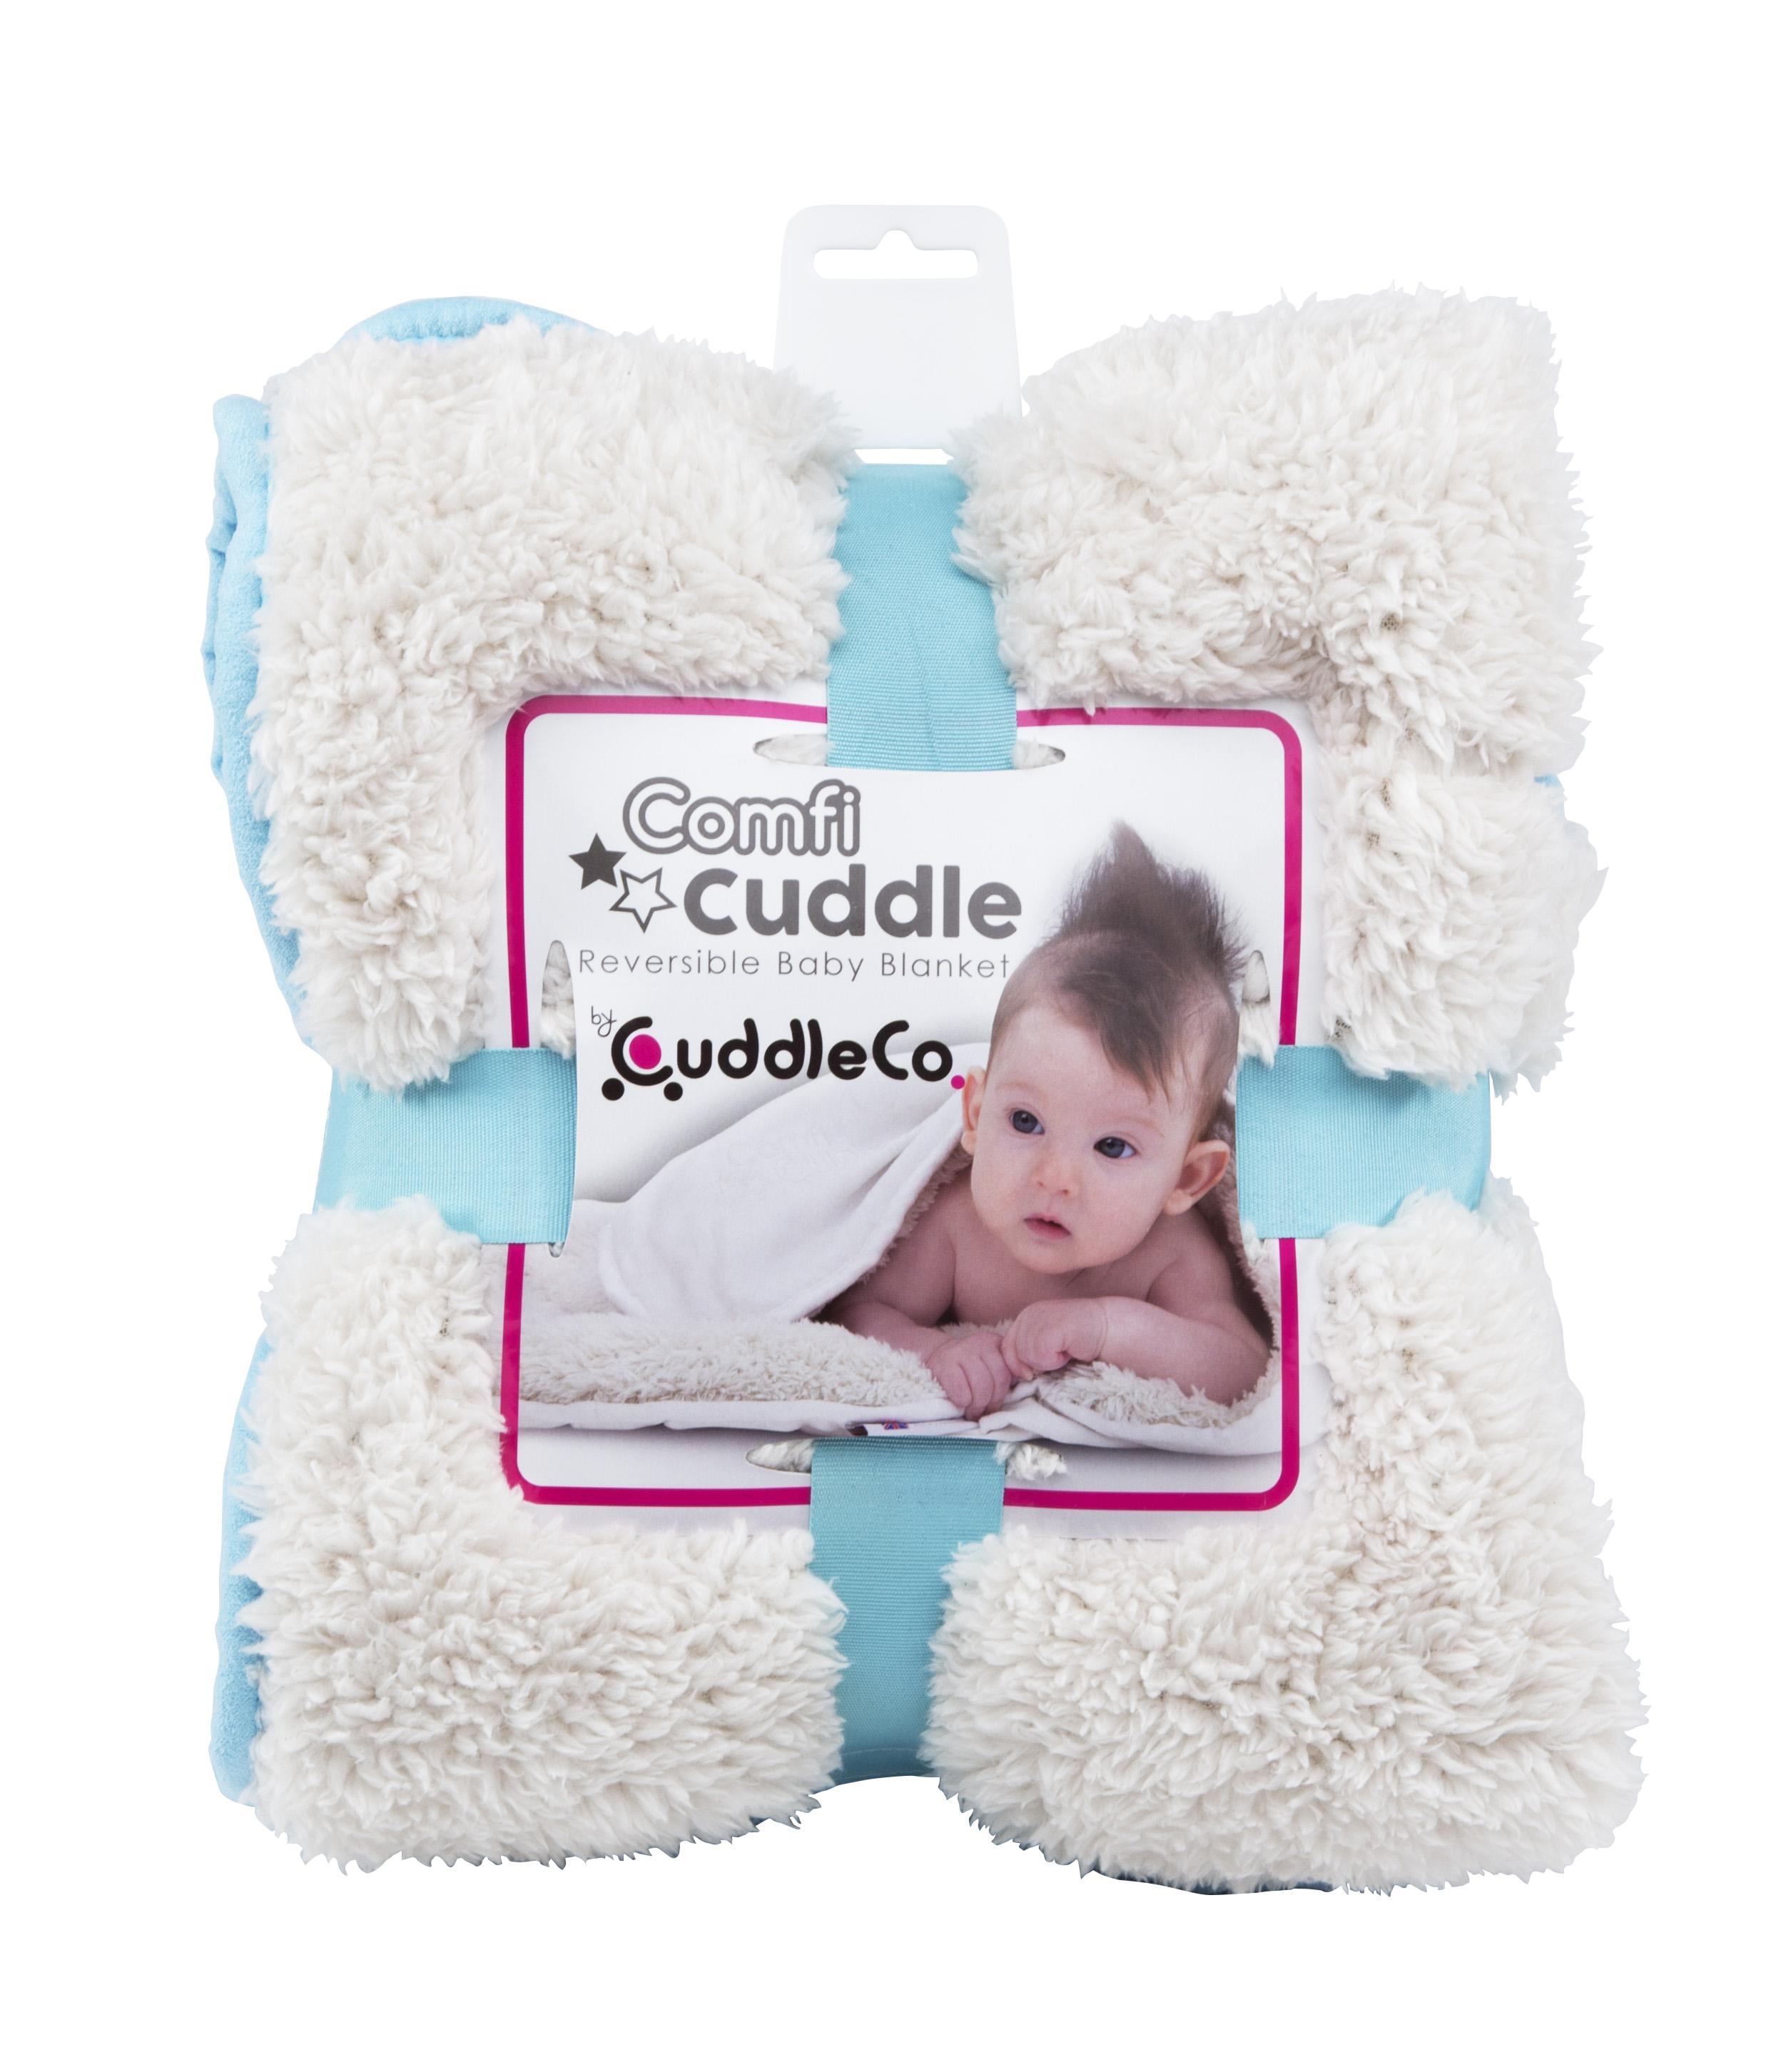 Dětská deka Comfi-Cuddle 110x75cm, Tiffany Blue